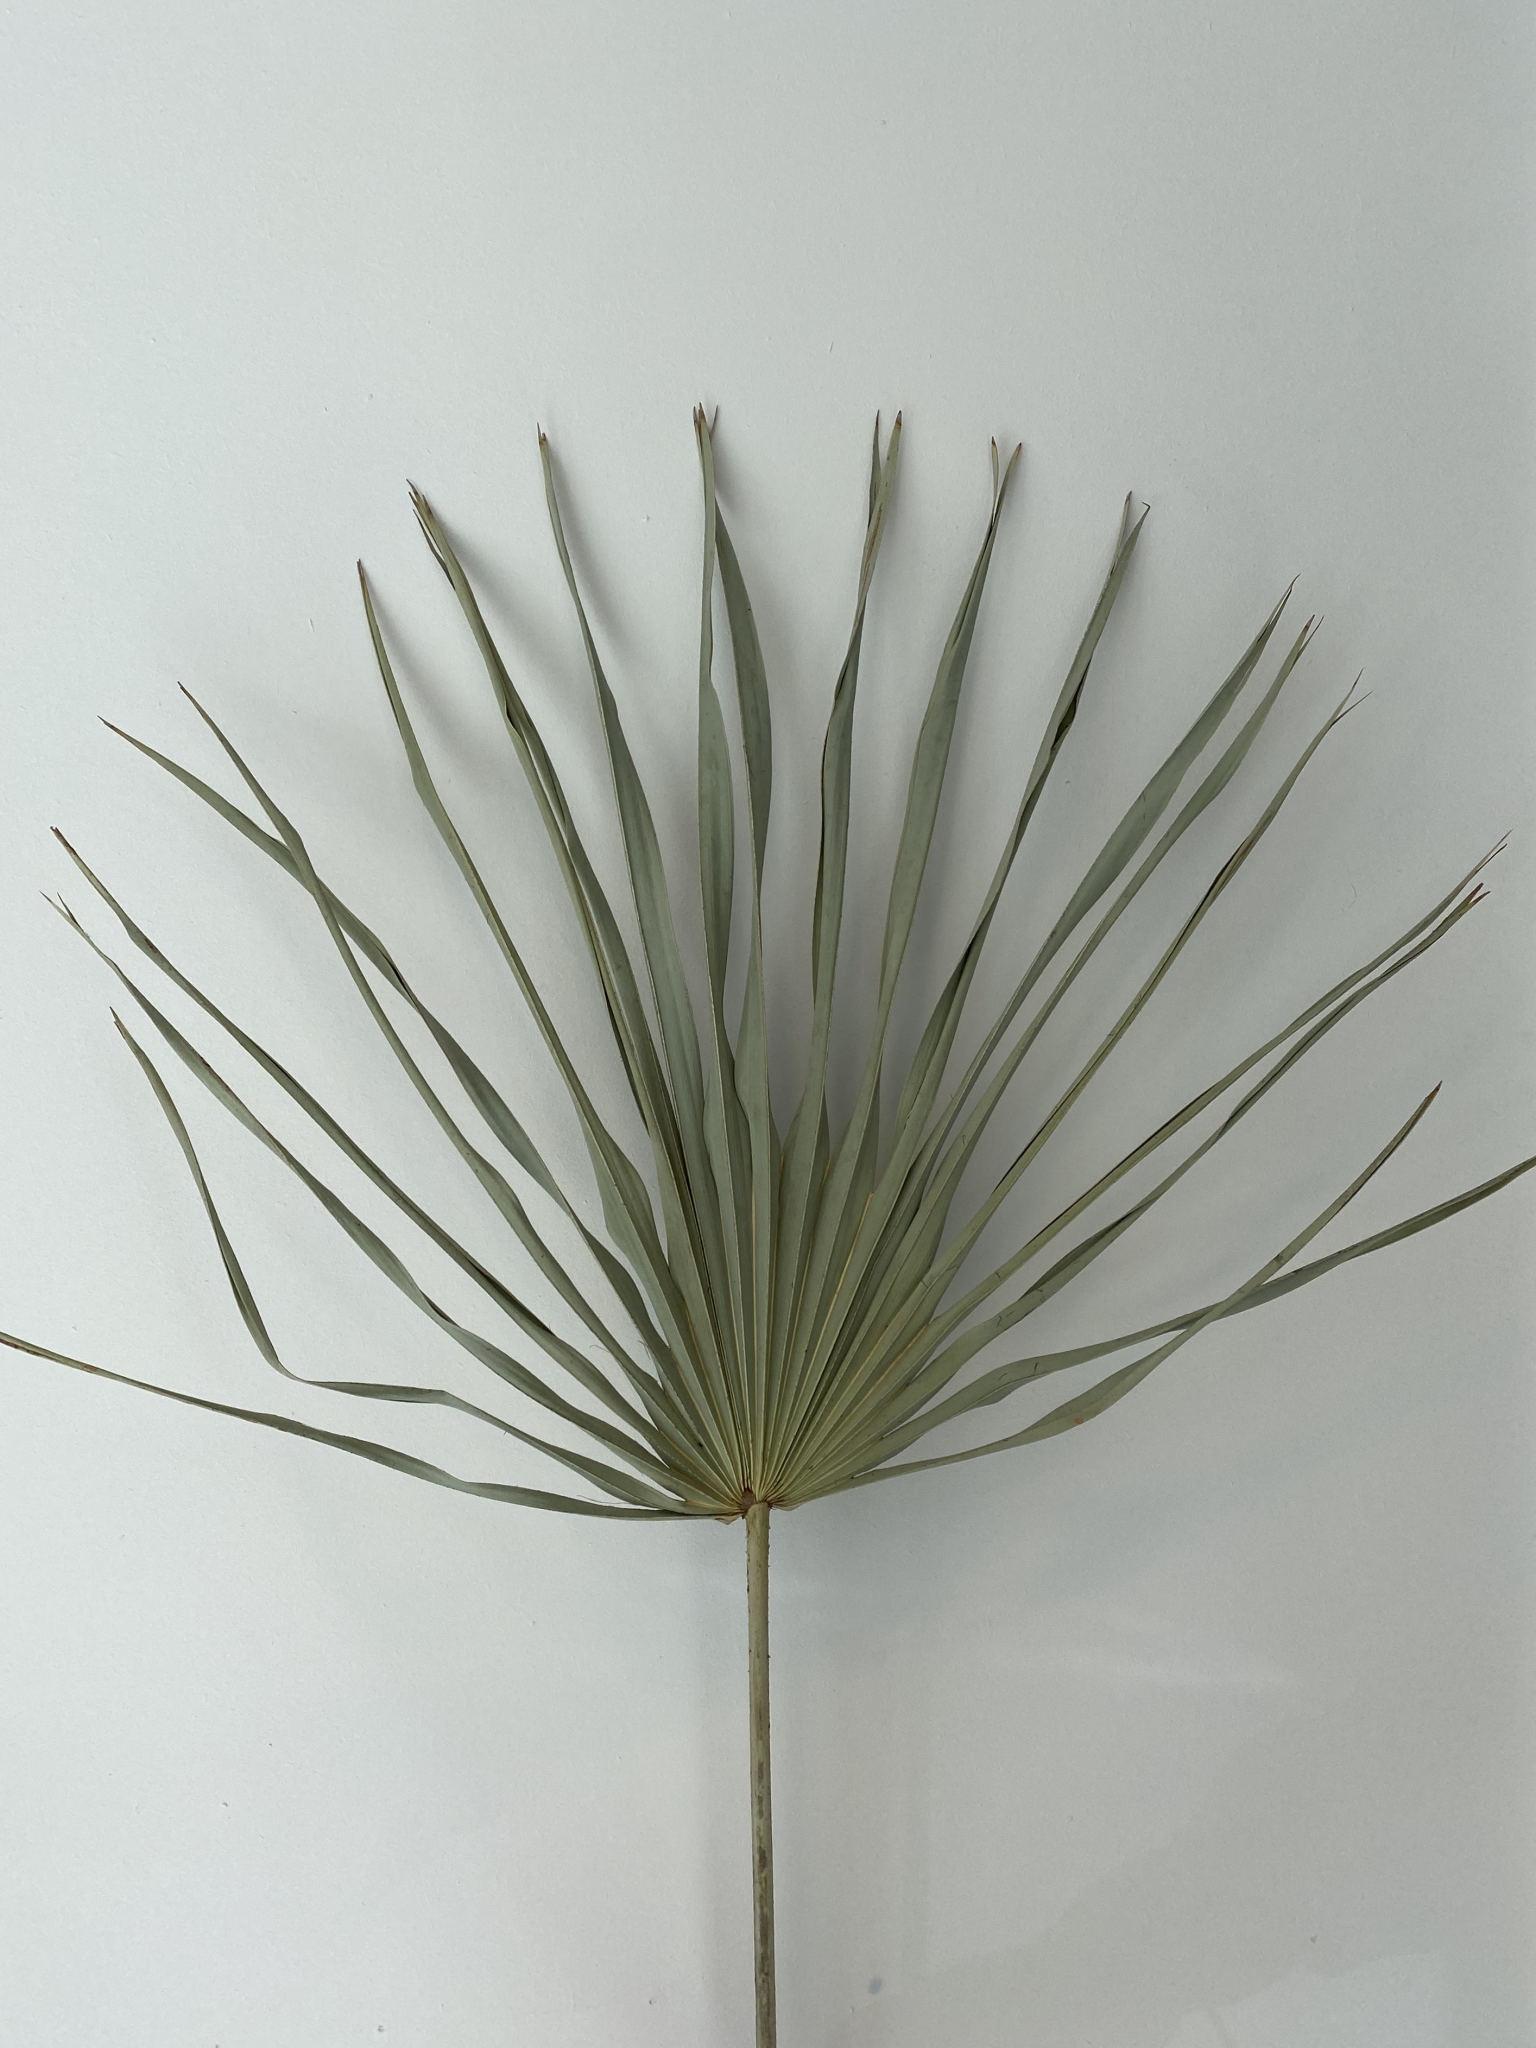 Gedroogd Palmblad Naturel-2